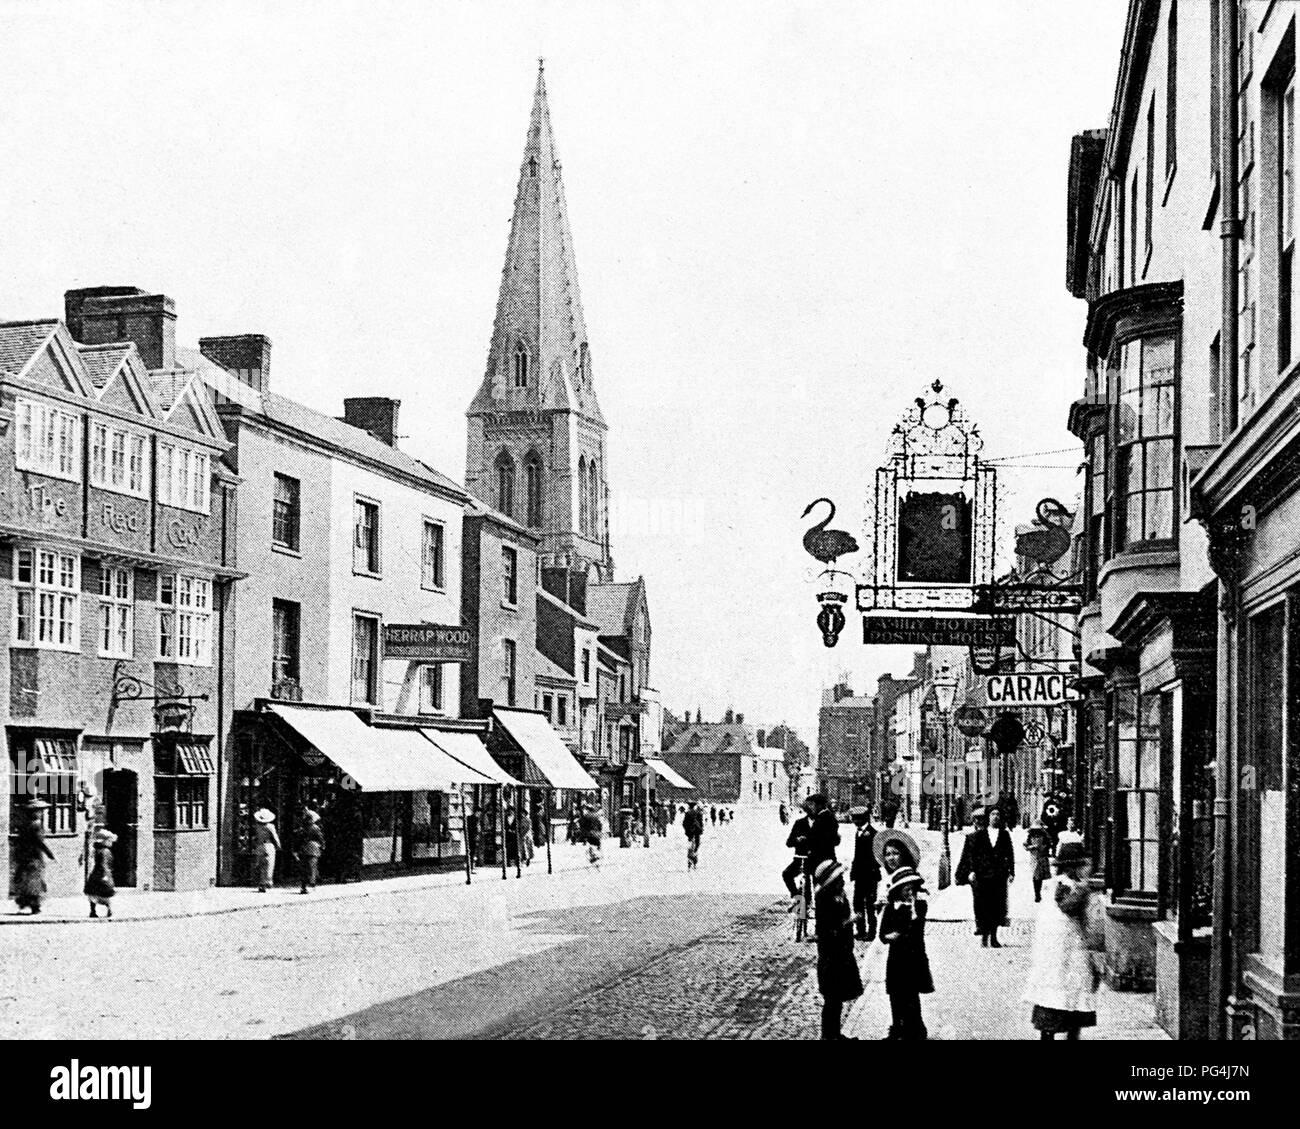 High Street, Market Harborough, Victorian period - Stock Image